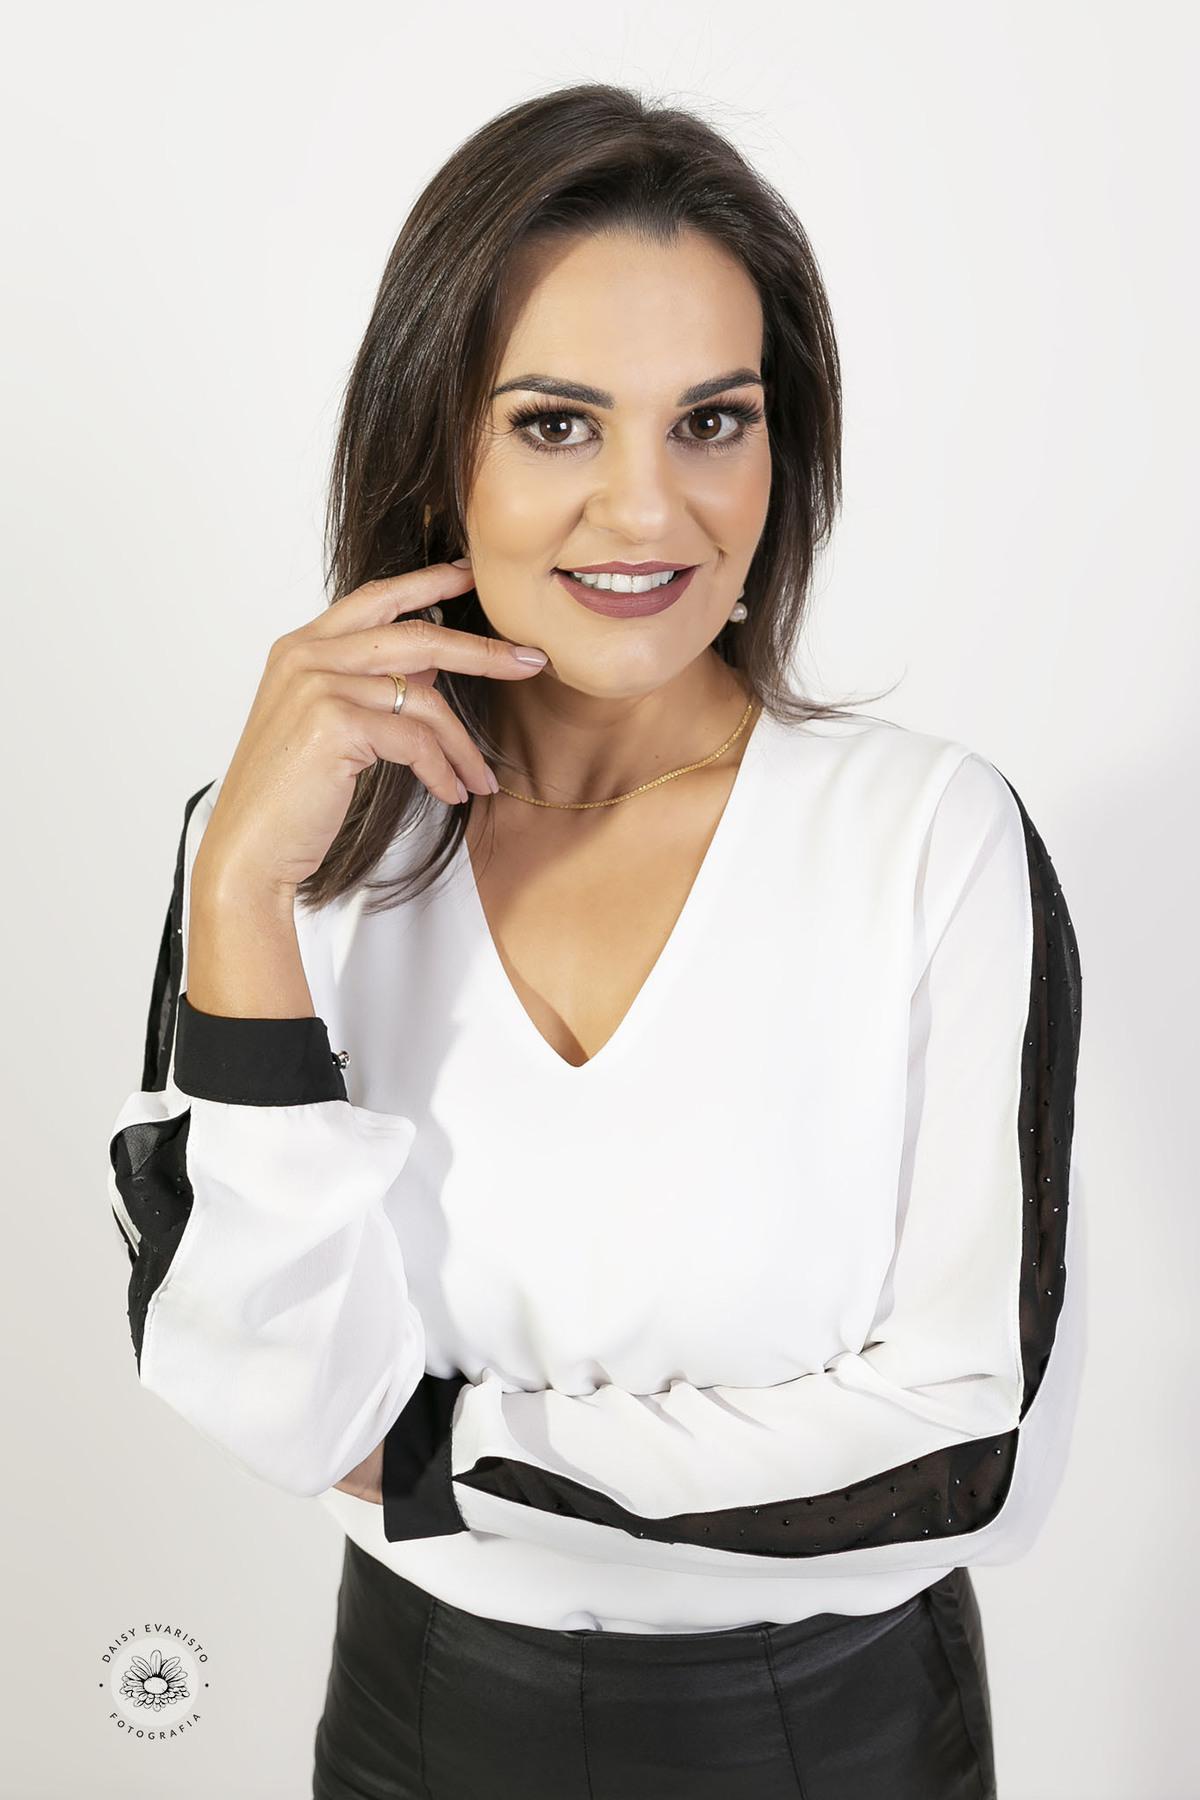 Elizane Stefanes e Leticia Portela Advogadas daisy evaristo fotografia fotografo ensaio profissional estudio joinville retrato corporativo perfil profissional foto para perfil profissional